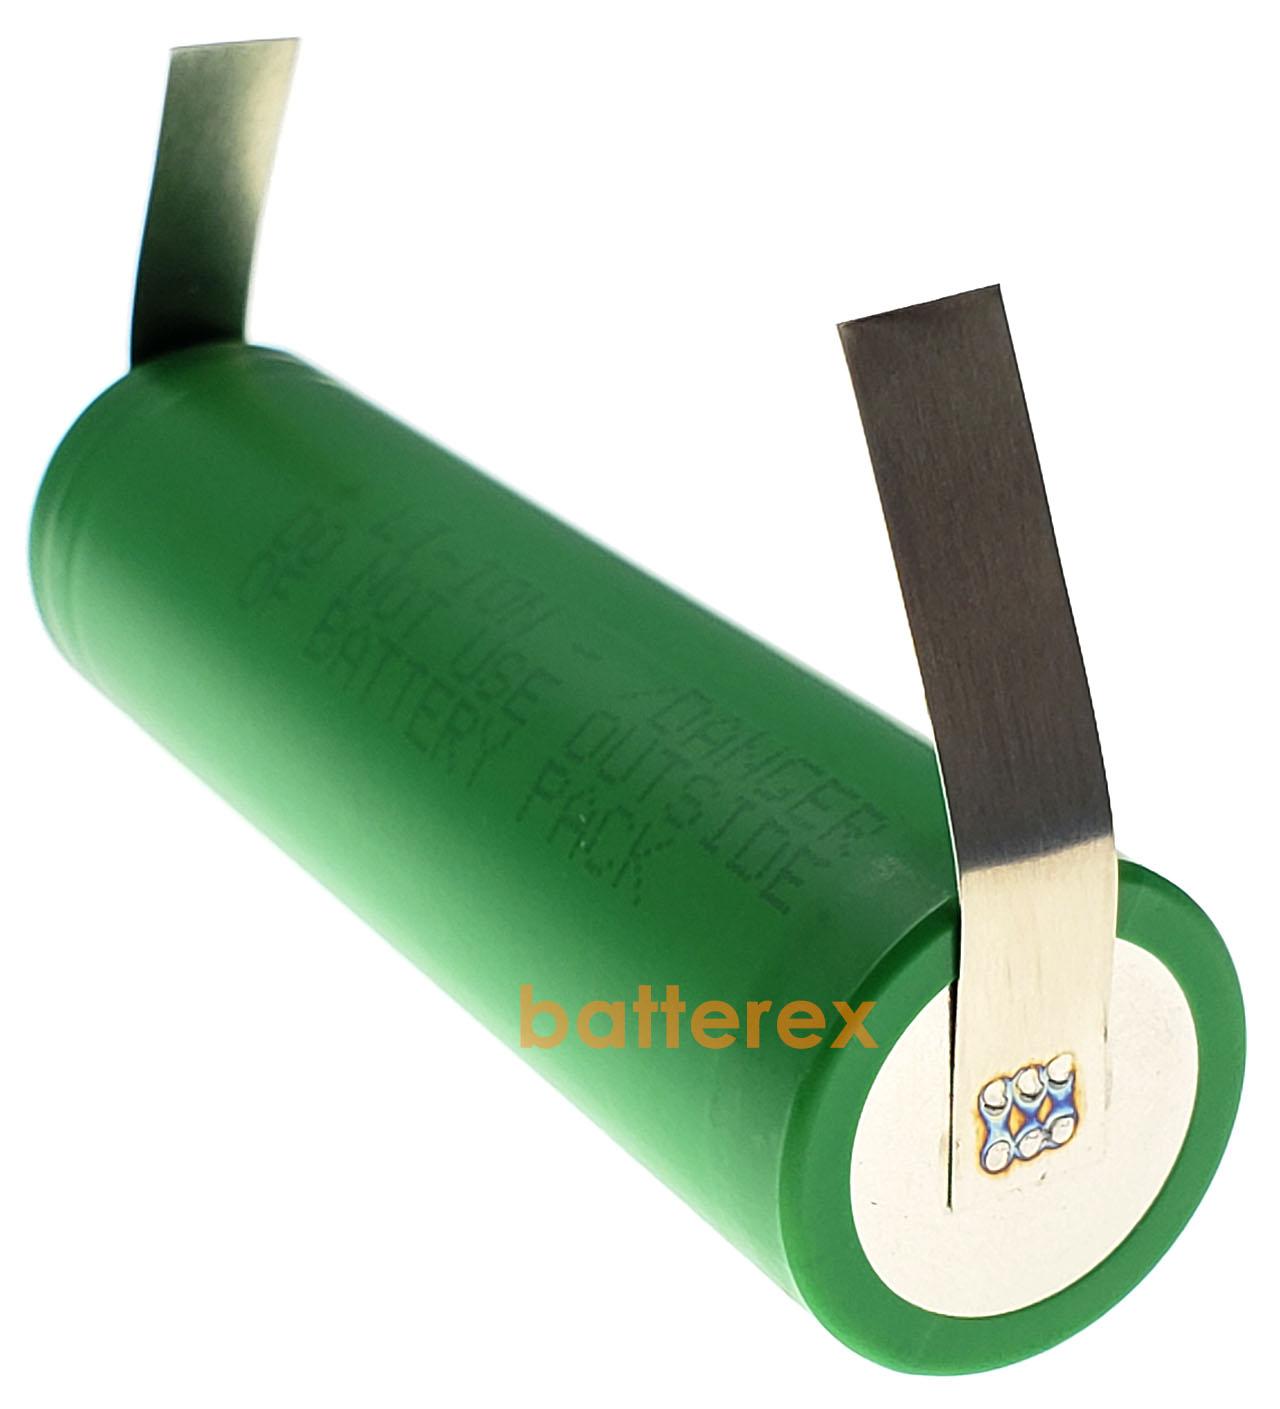 аккумулятор 18650 для шуруповёрта, пылесоса, болгарки